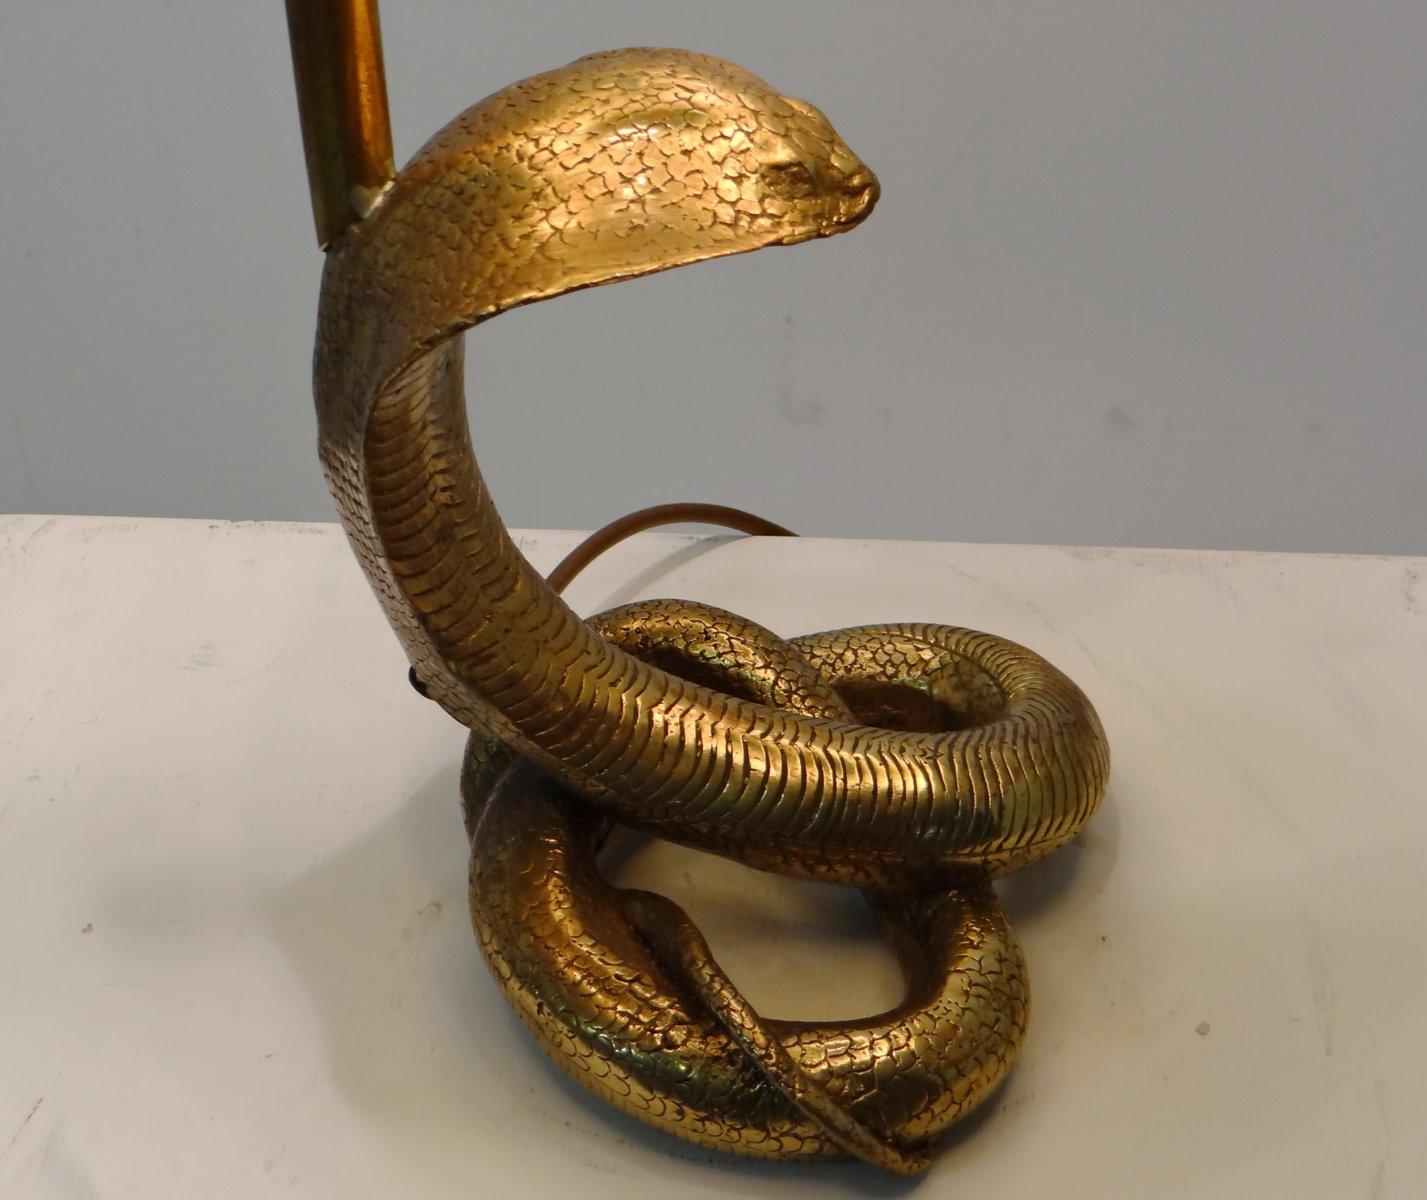 vintage kobra messing tischlampe bei pamono kaufen. Black Bedroom Furniture Sets. Home Design Ideas